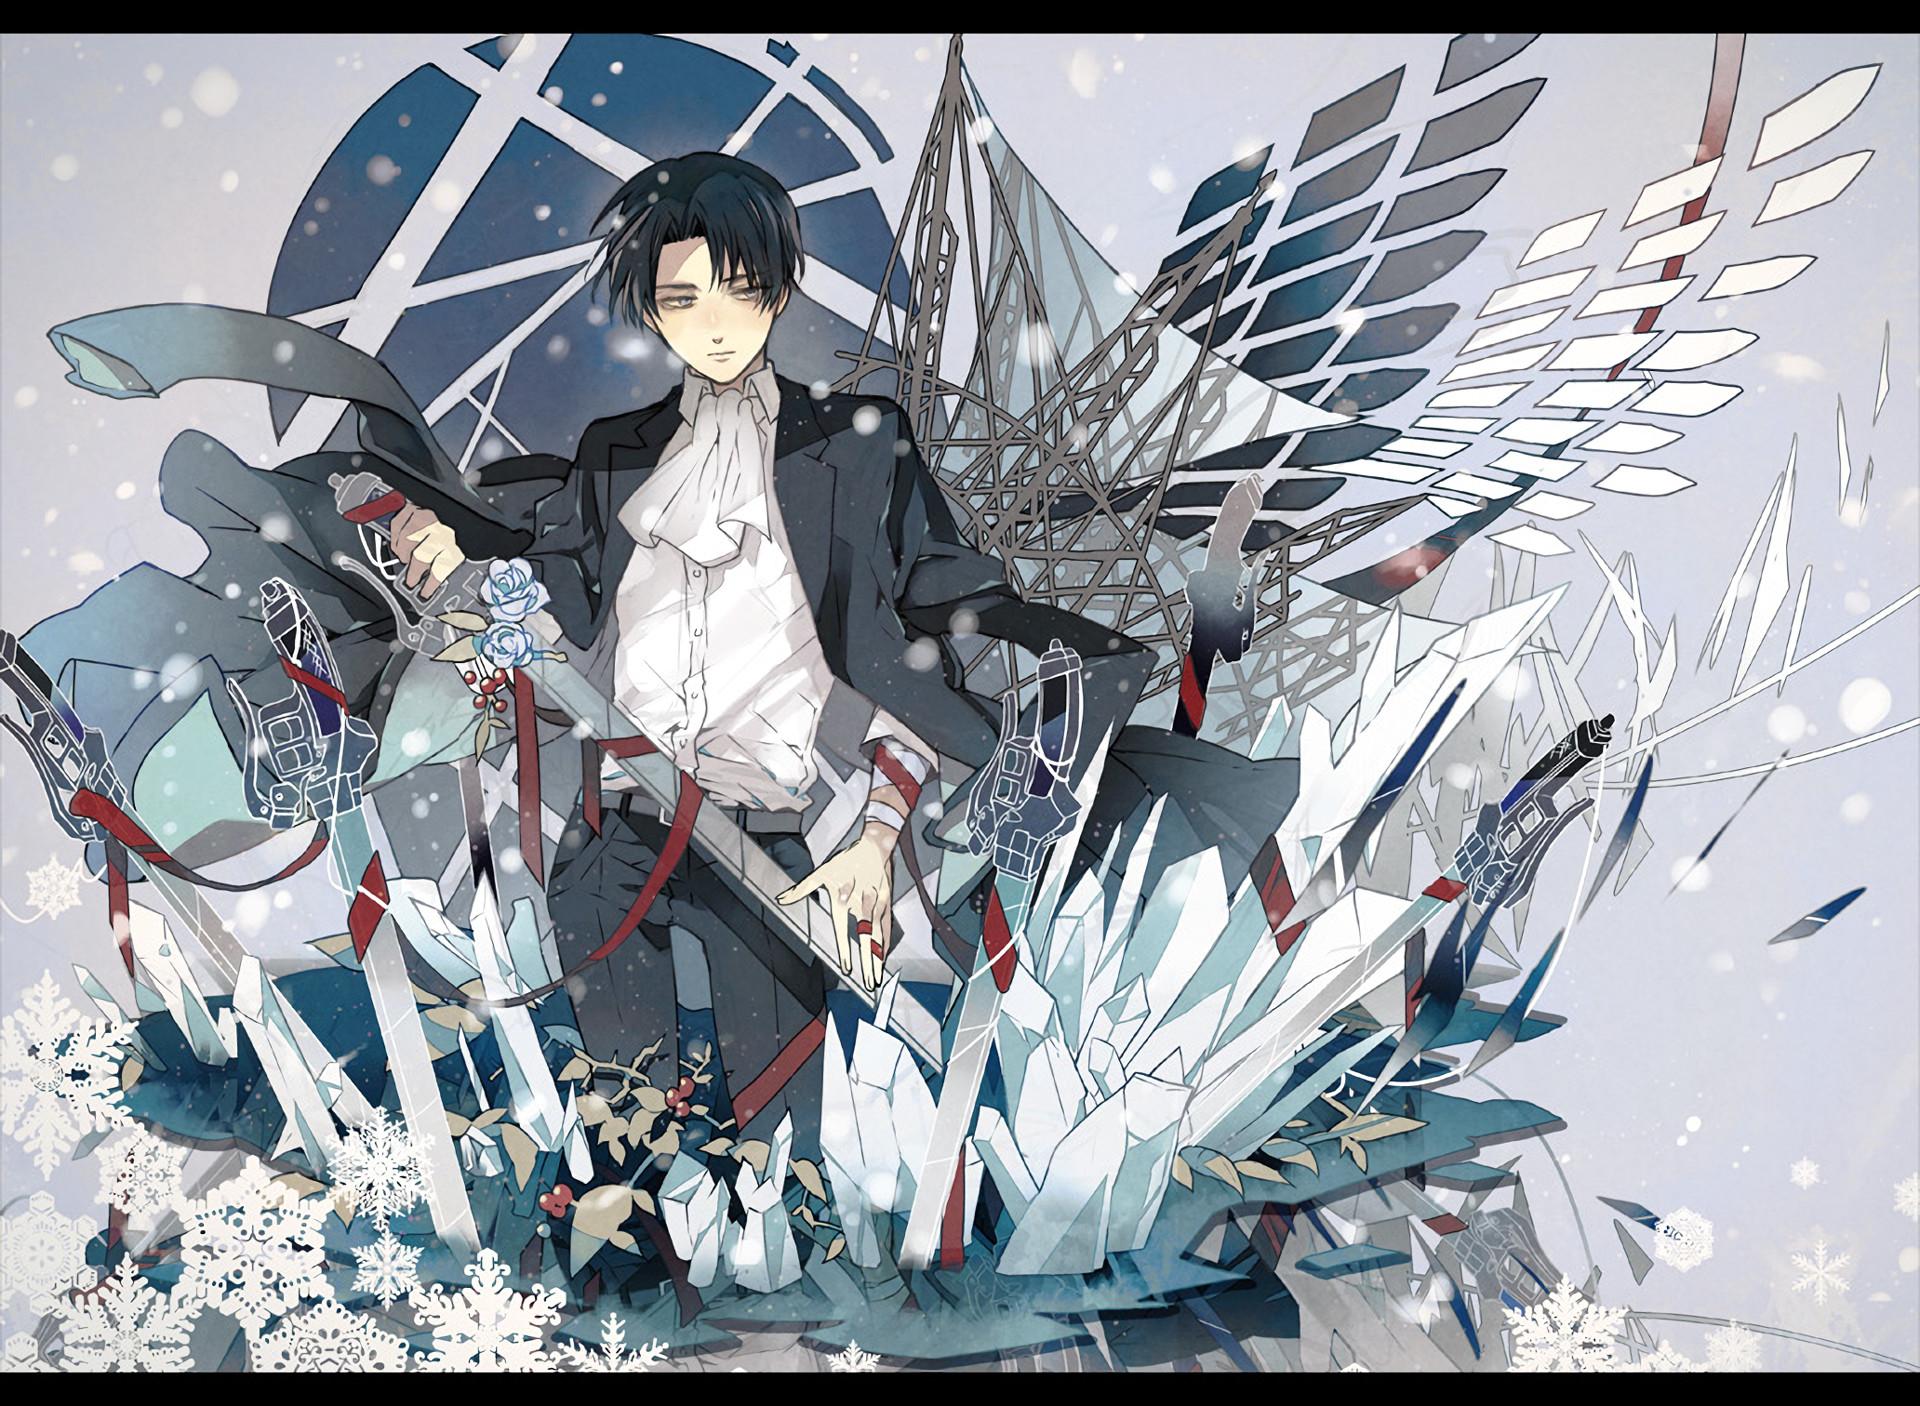 Anime – Attack On Titan Levi Ackerman Shingeki No Kyojin Wallpaper